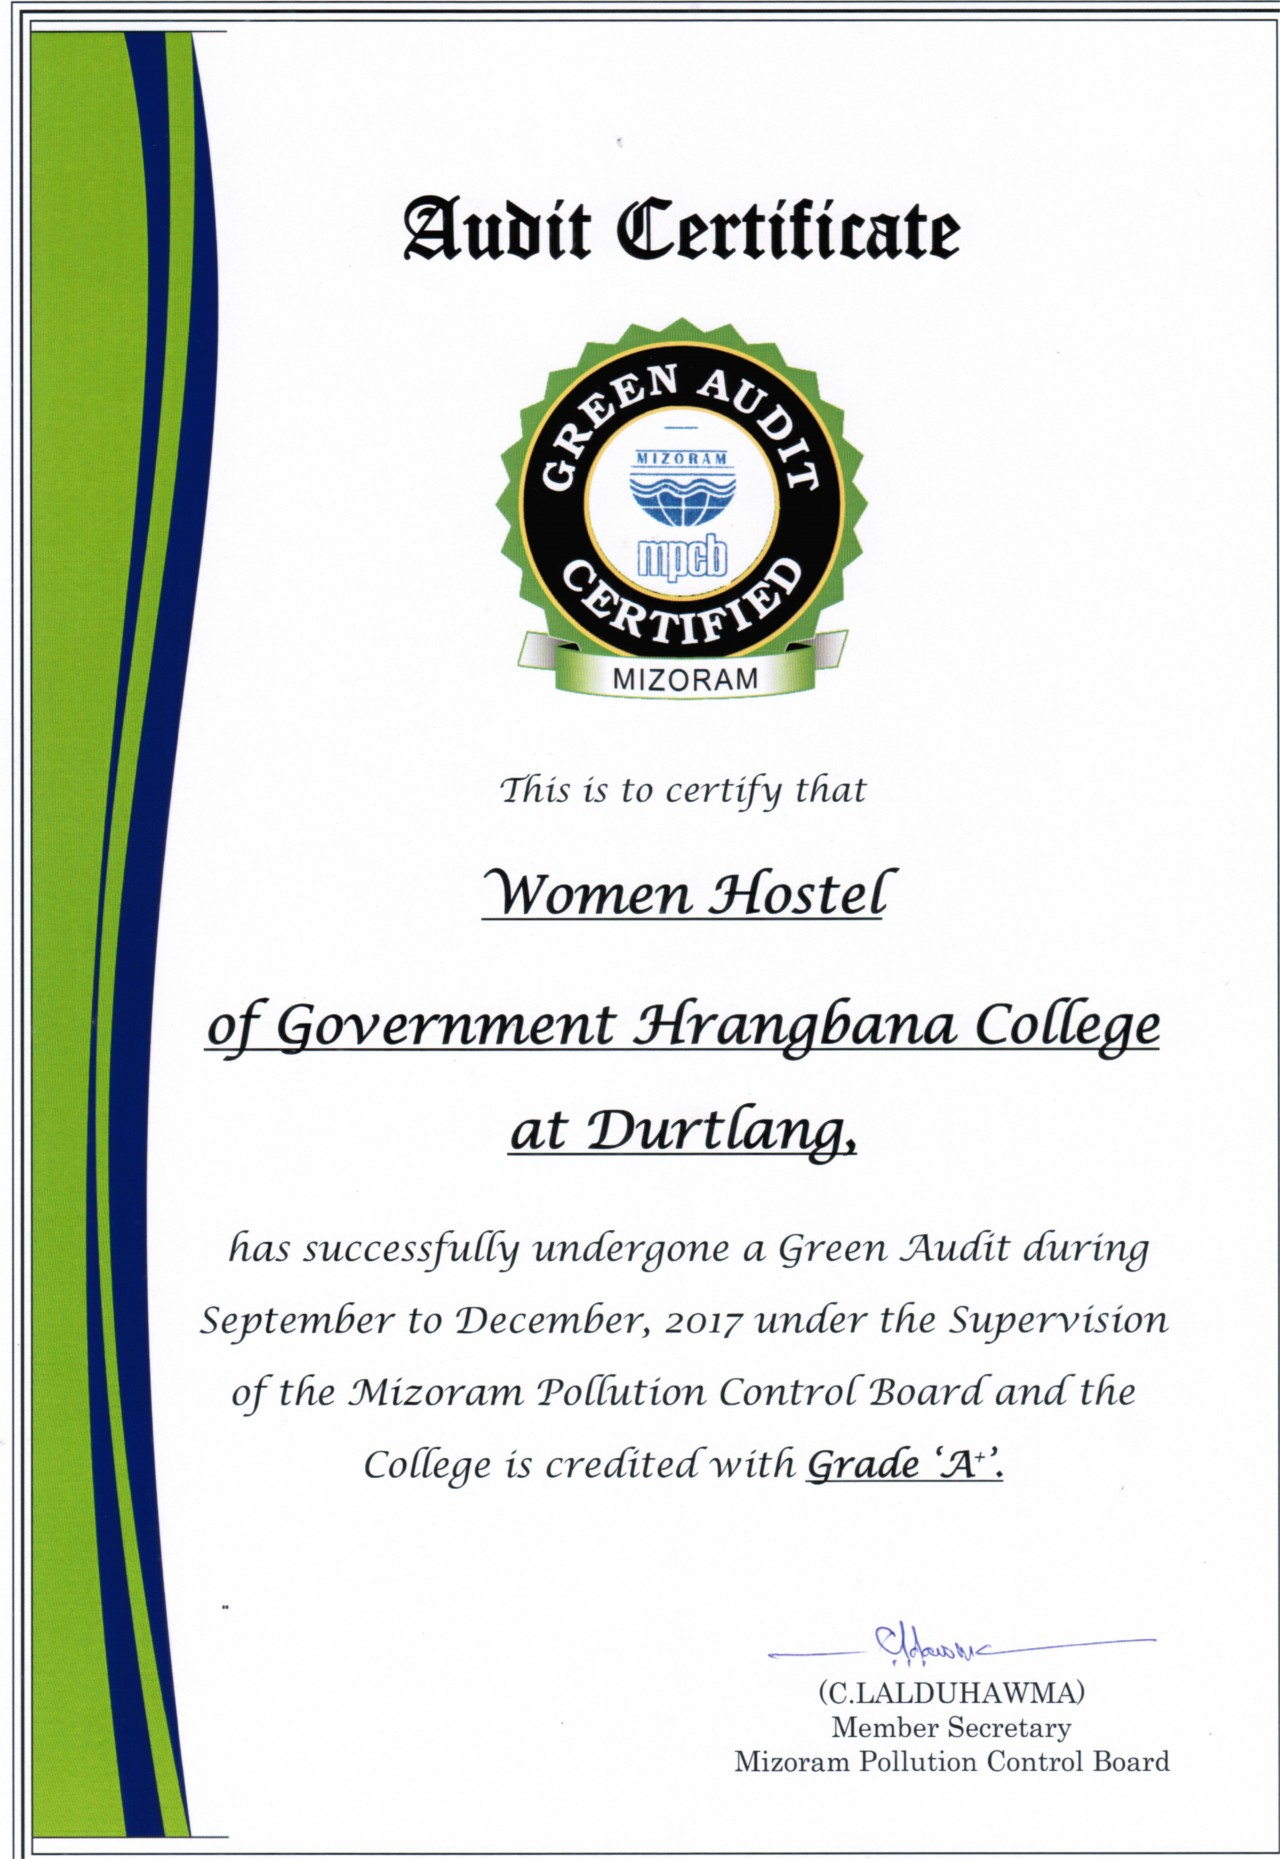 Govt Hrangbana College Green Audit Certificate